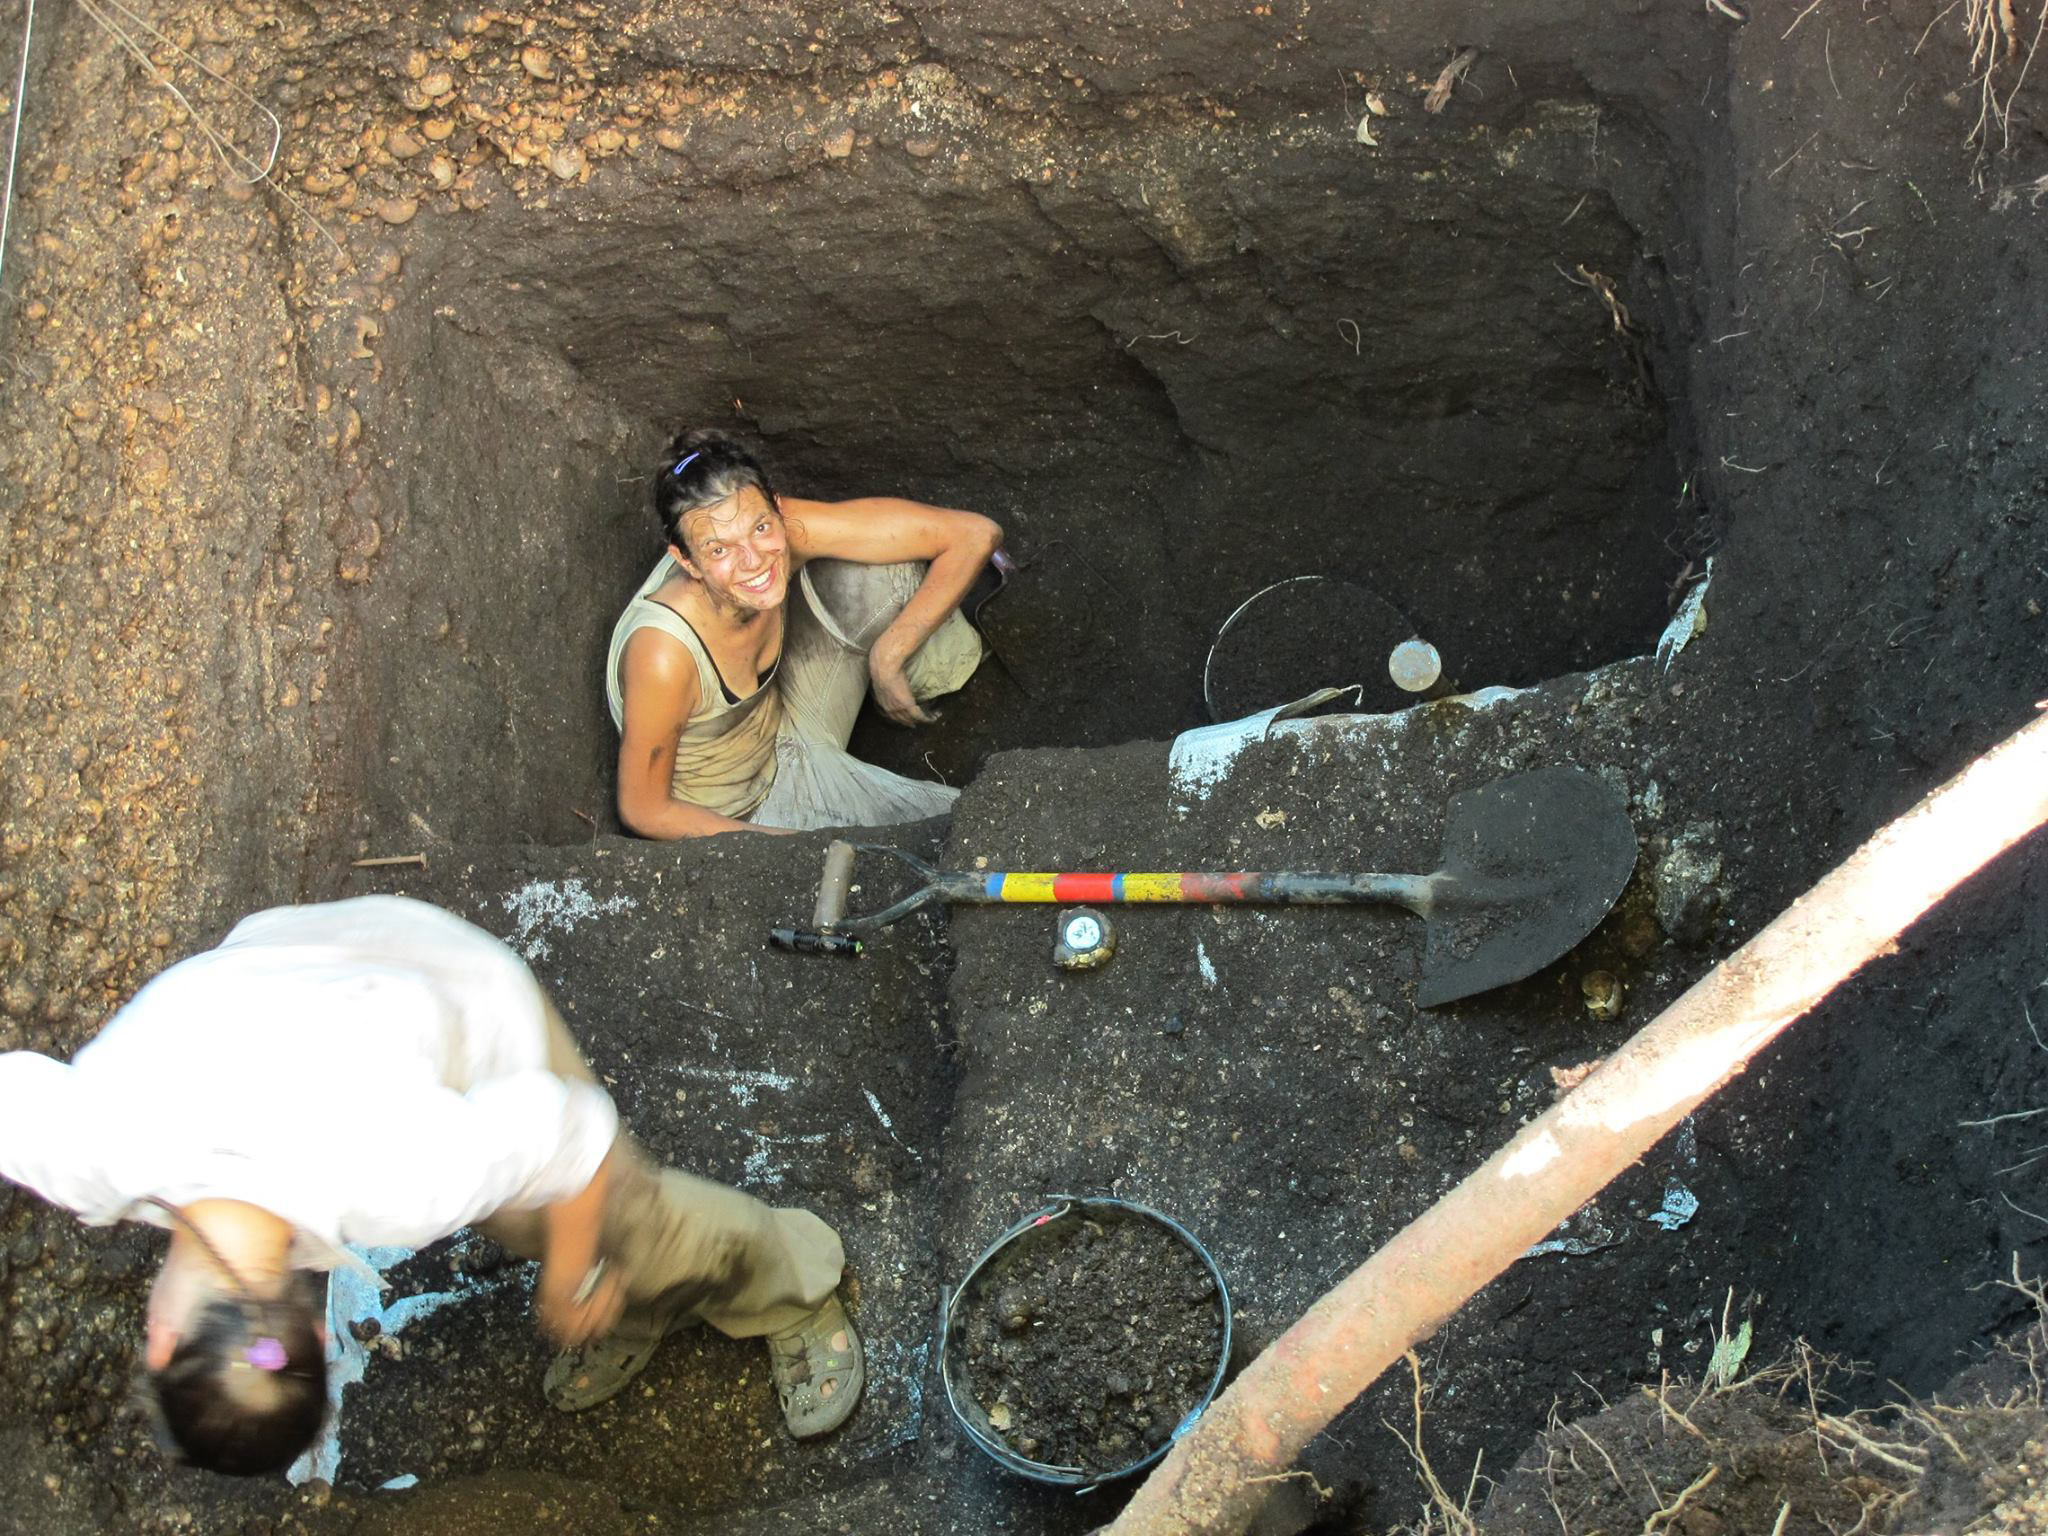 Peixe era o principal alimento dos povos pré-colombianos da Amazônia